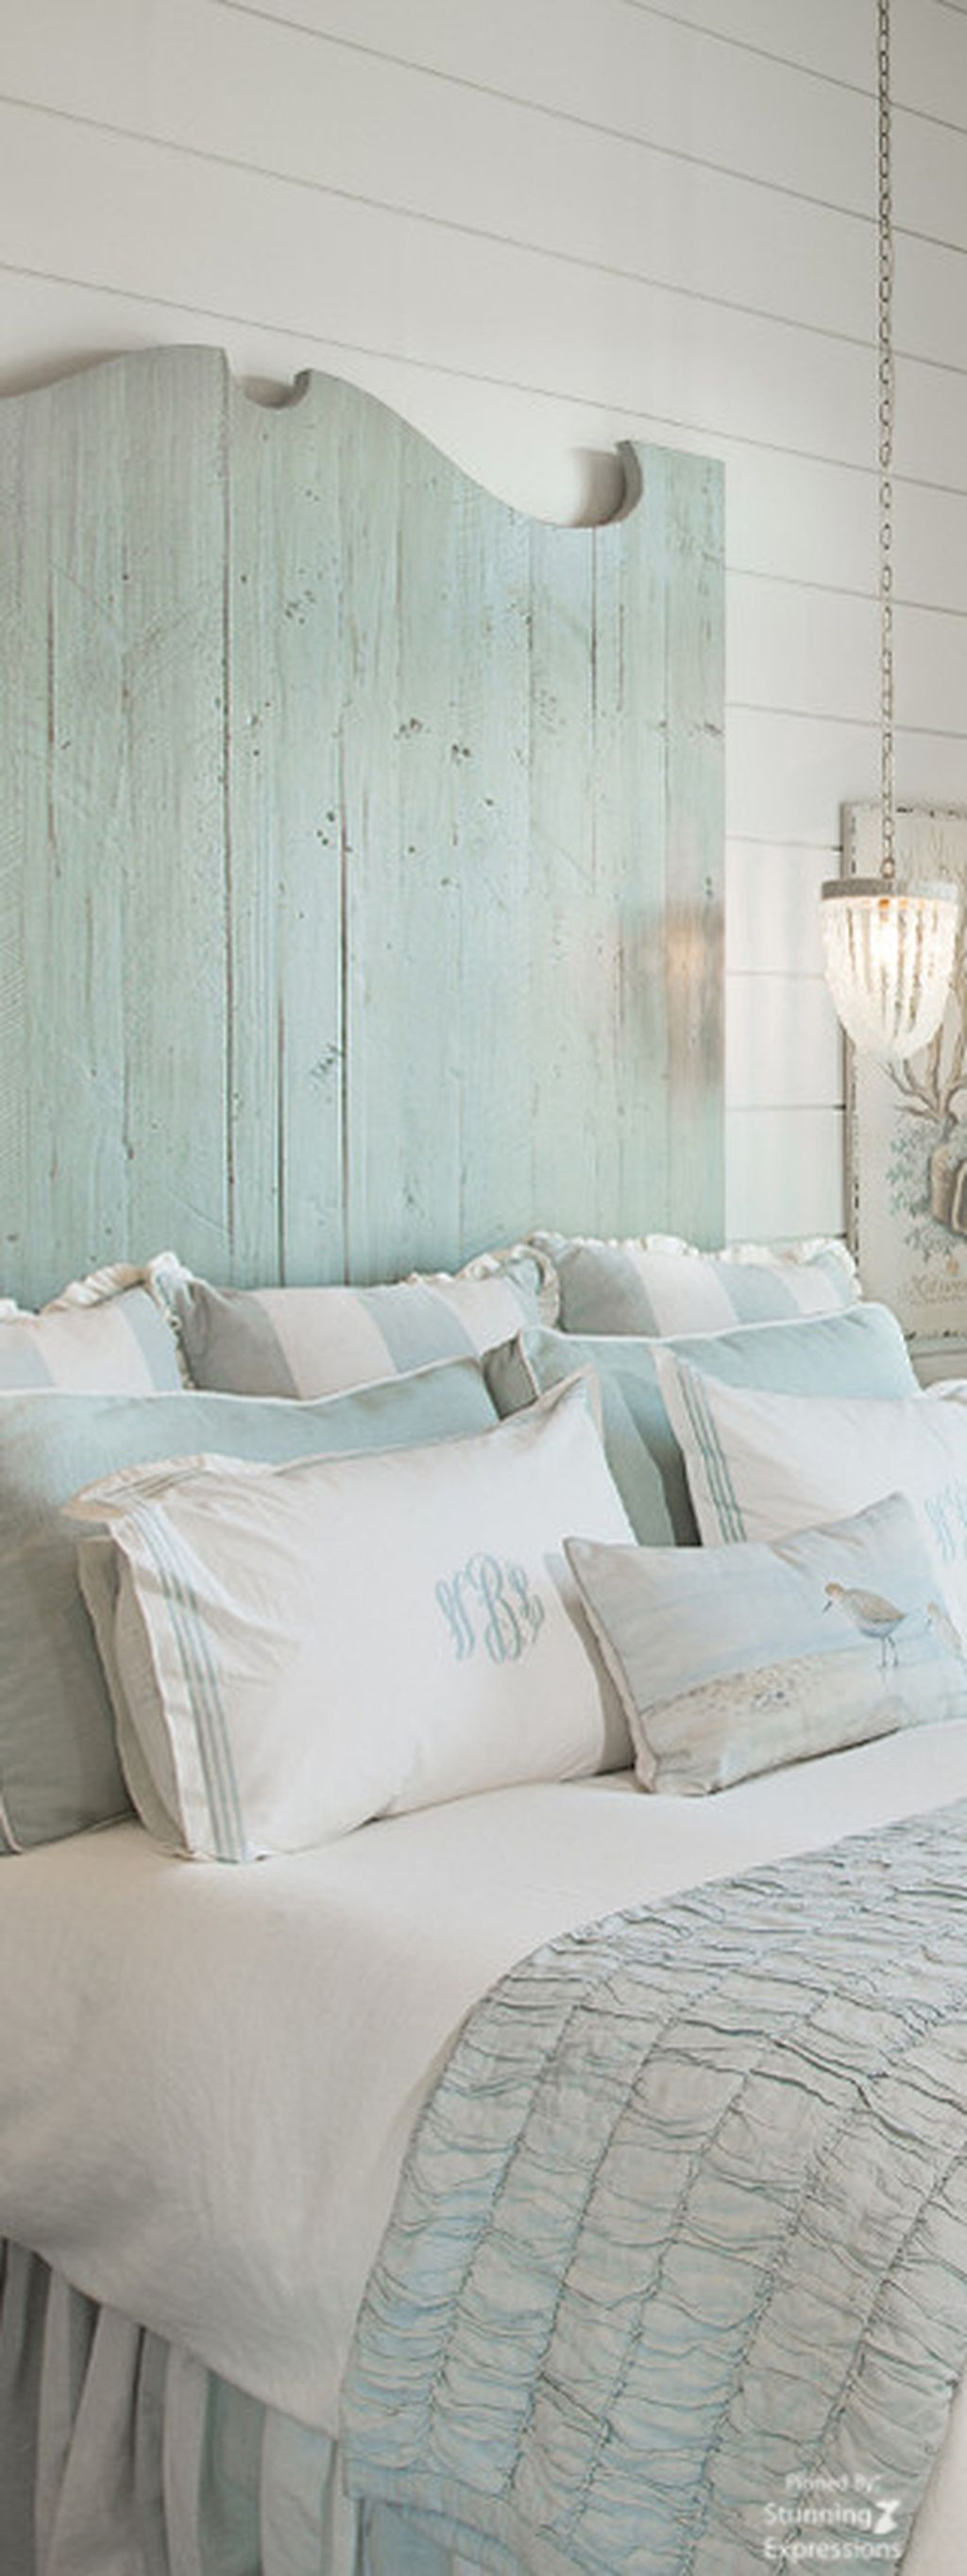 88 Romantic Shabby Chic Cottage Decoration Ideas | Romantic shabby ...